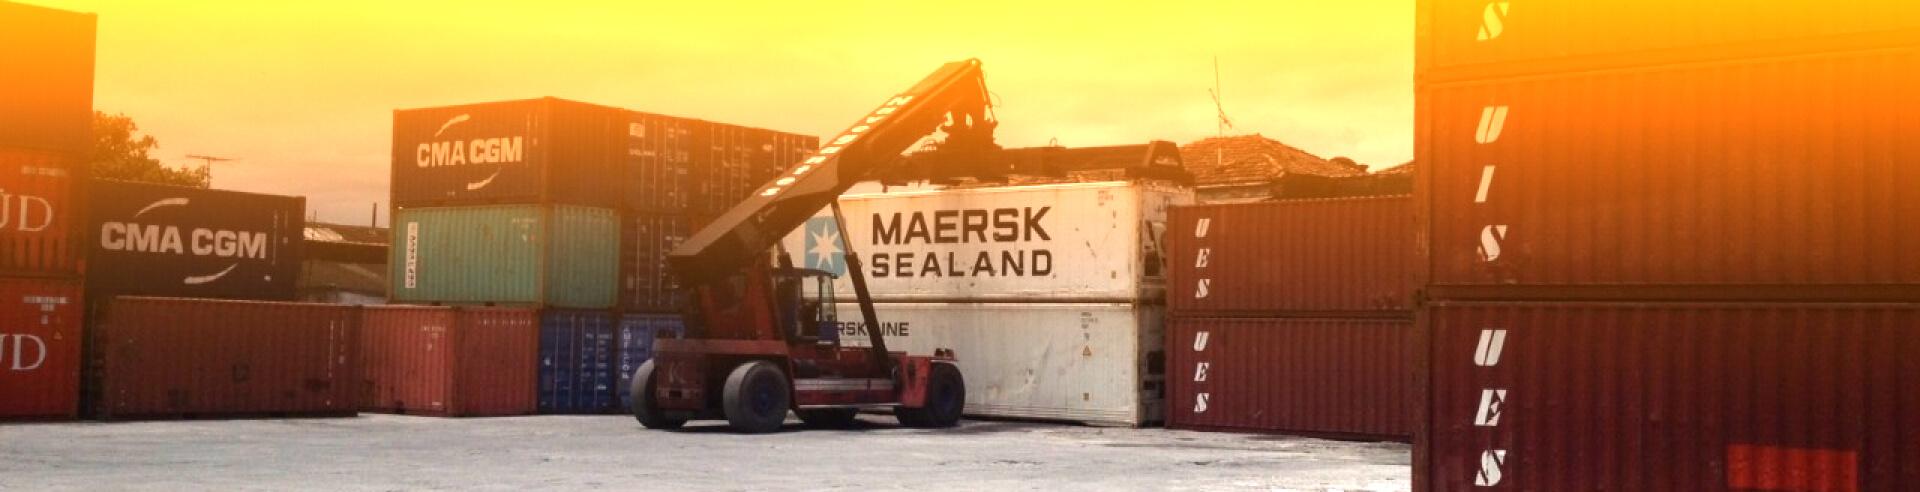 Empilhadeira Stacker   Transportadora Navegantes